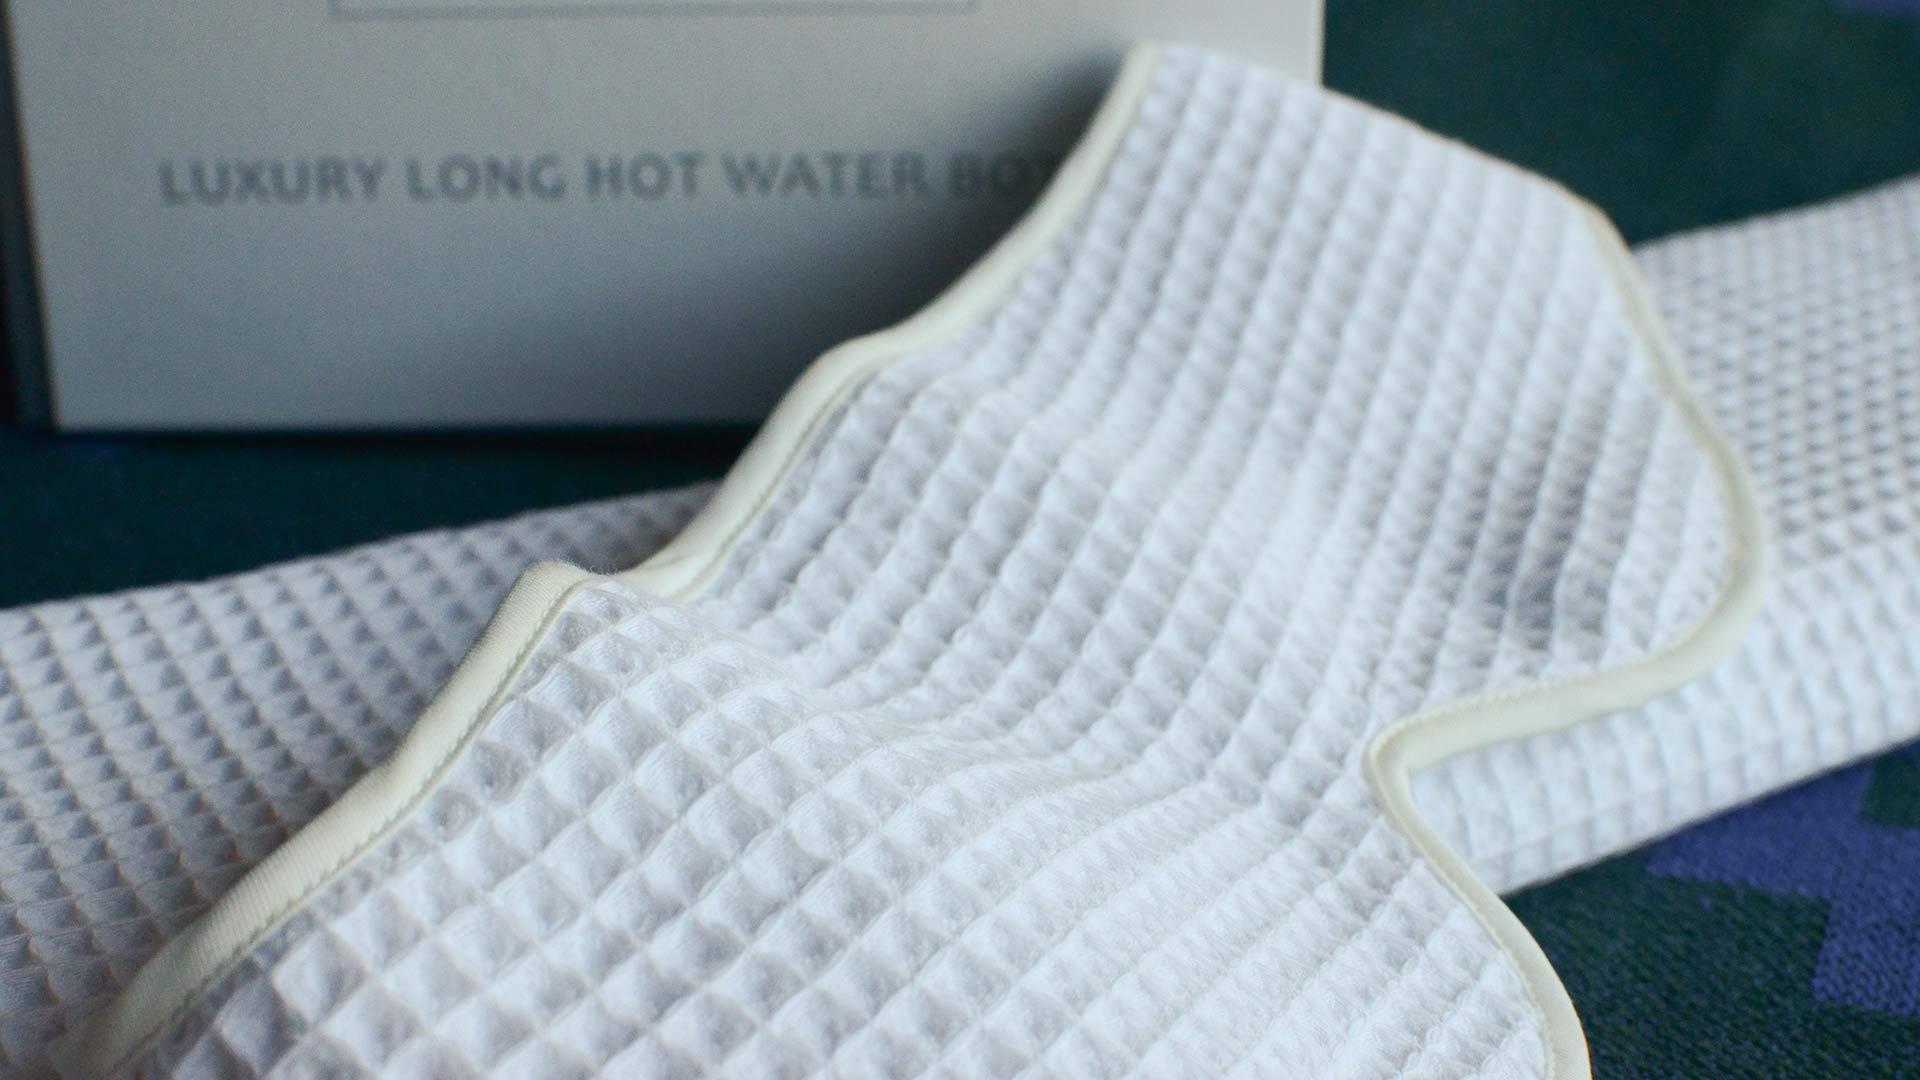 white-waffle-yuyu-hotwater-bottle-&-eye-mask